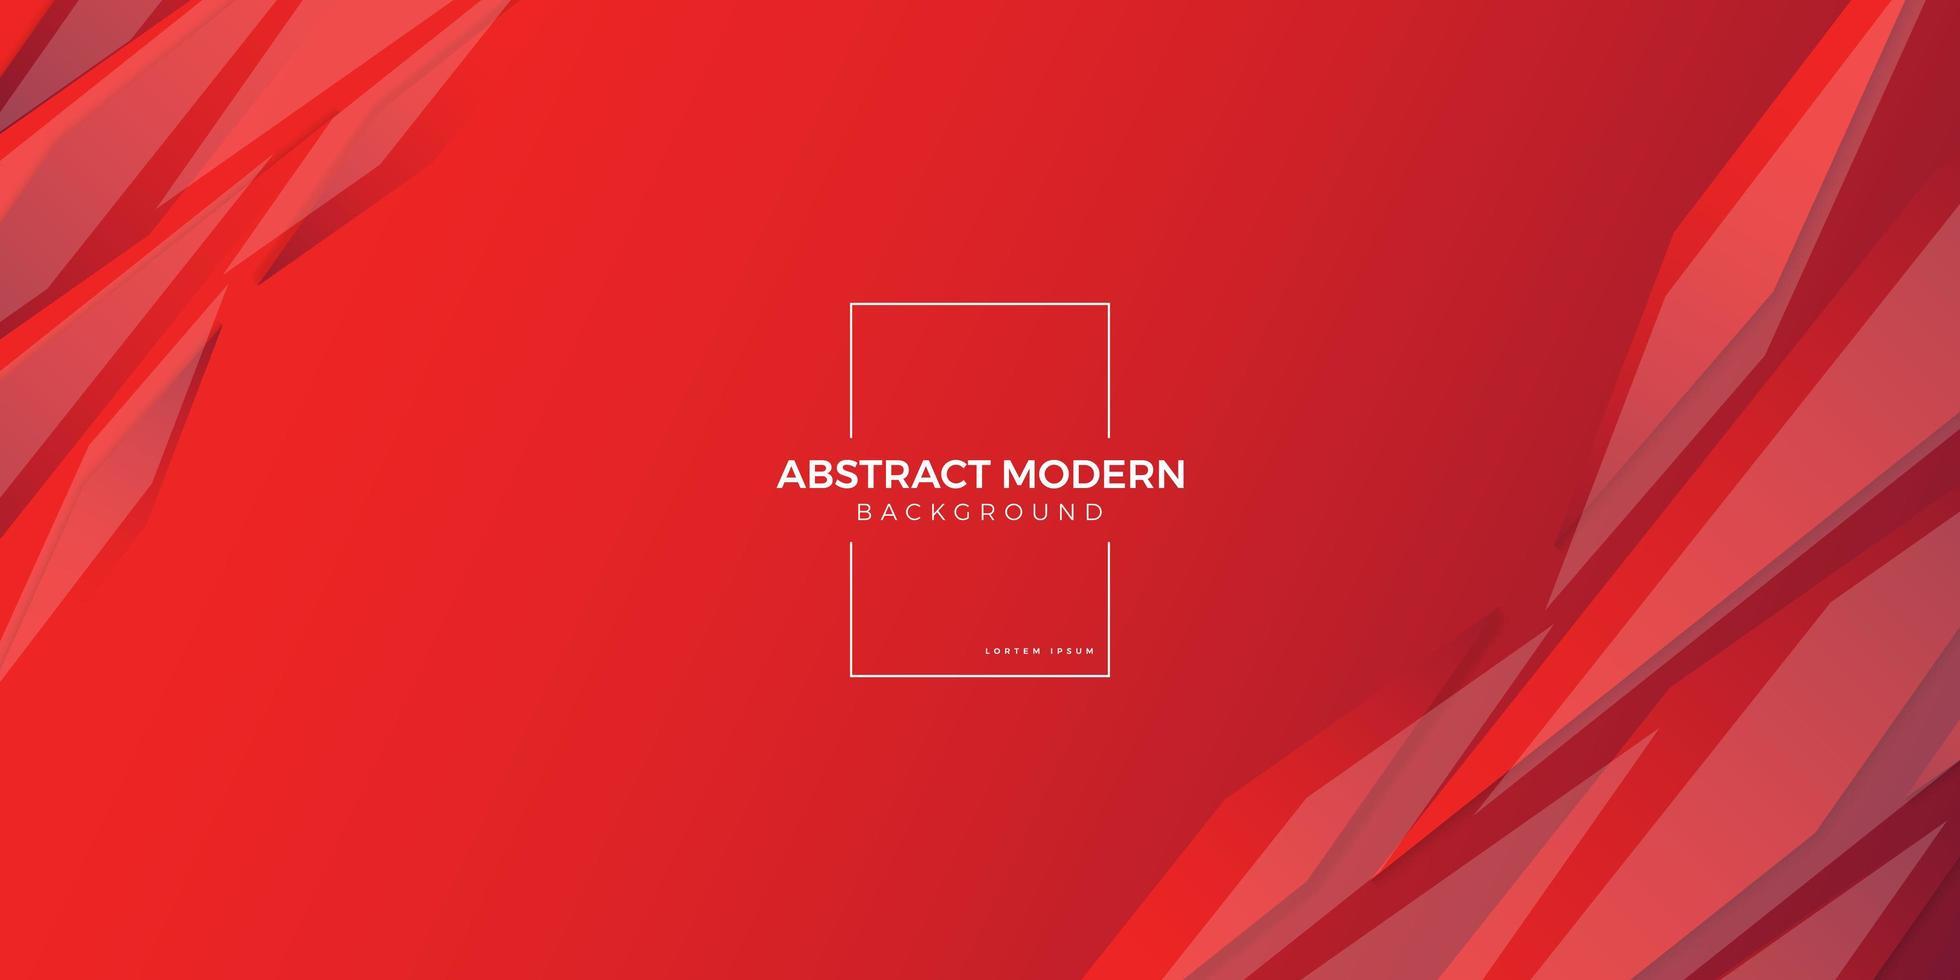 Rood geometrisch ontwerp als achtergrond vector